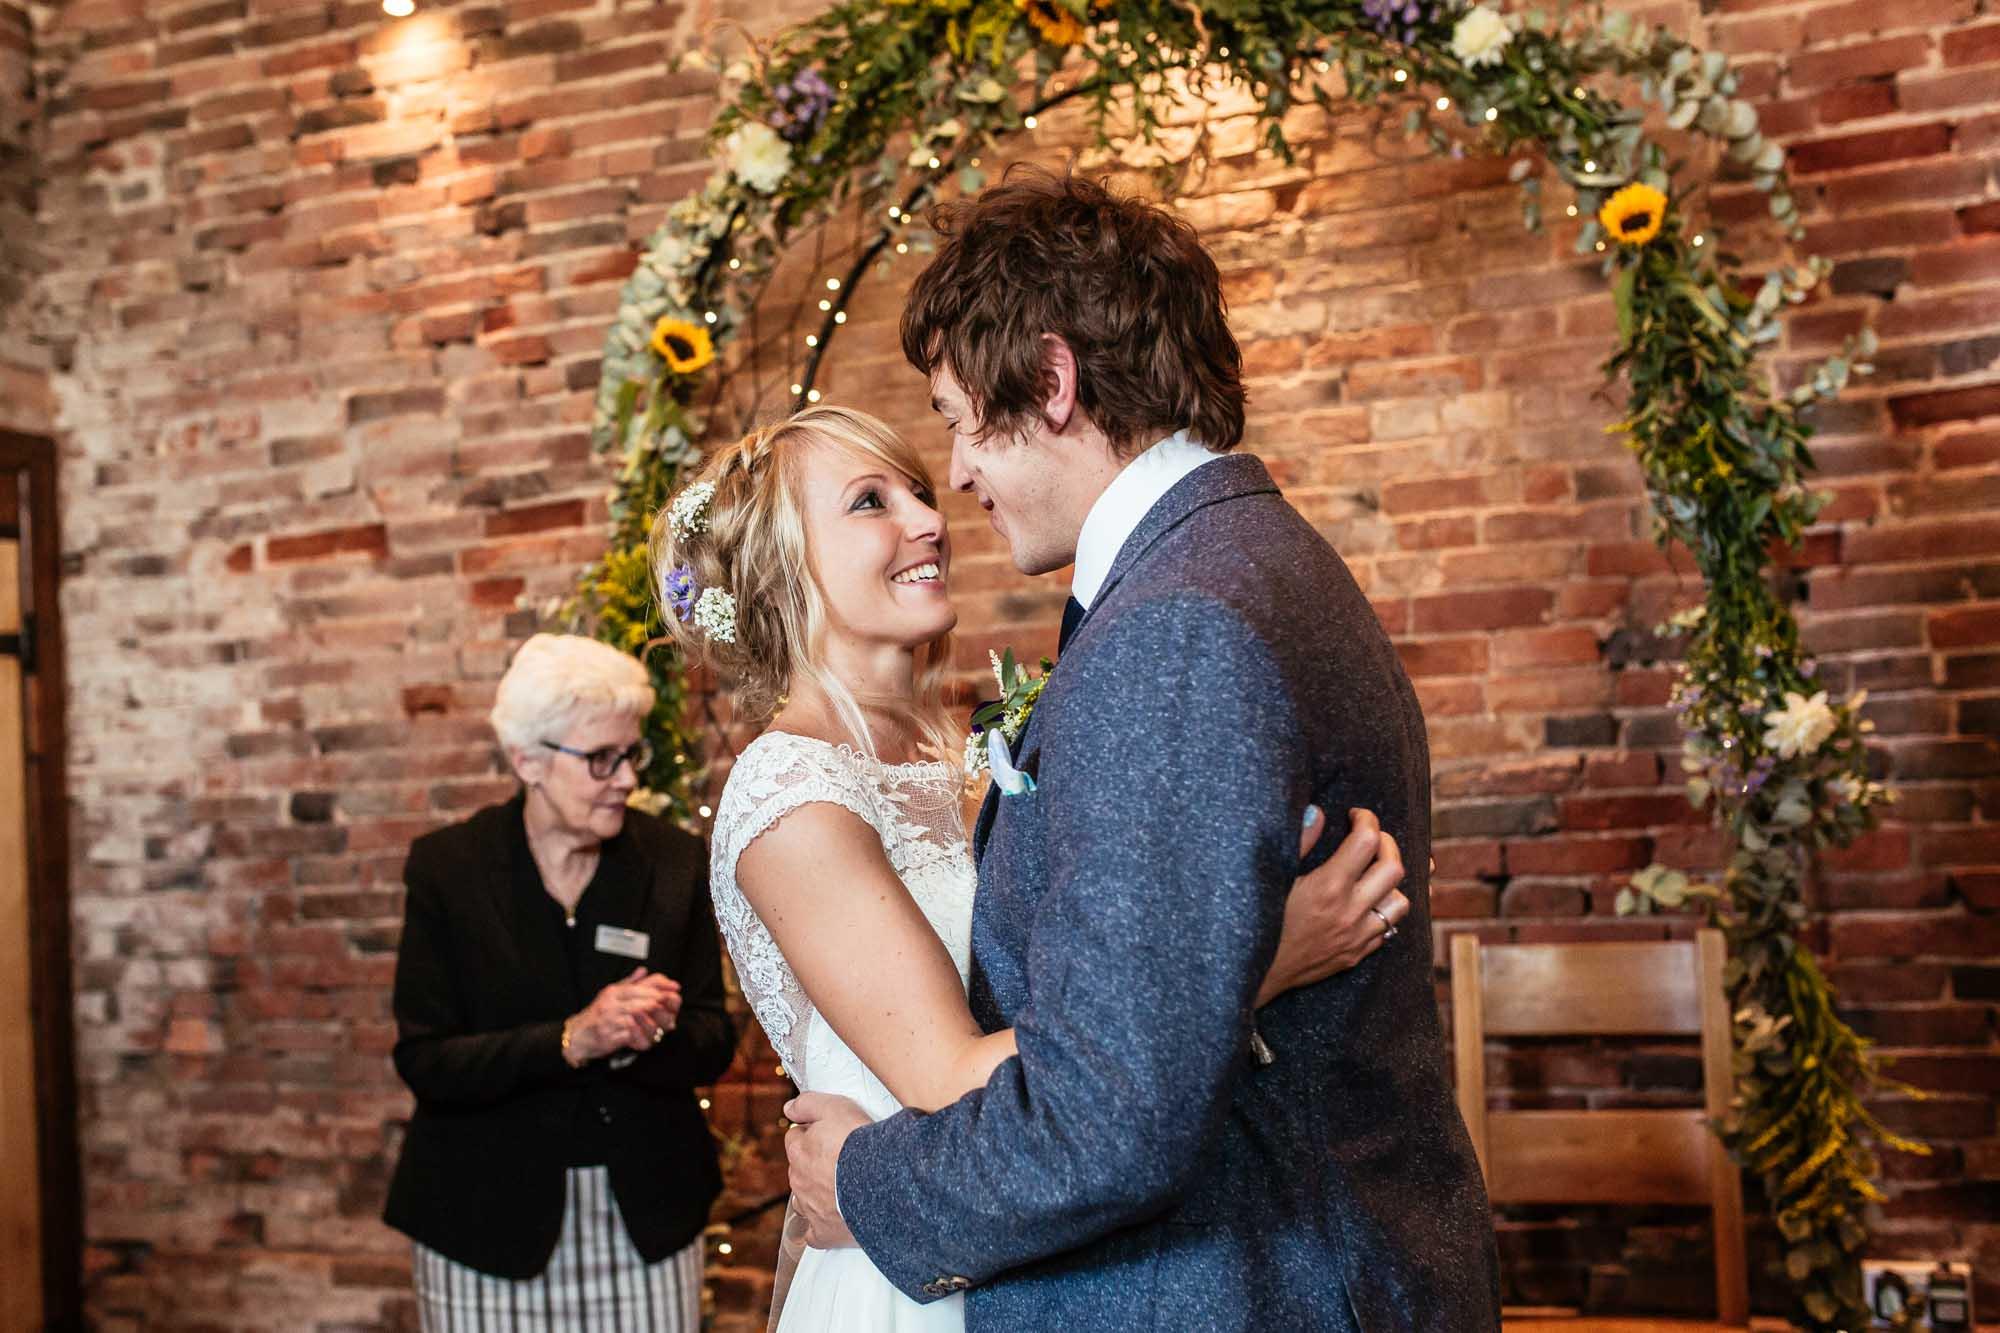 Colourful Barn Wedding Ceremonies